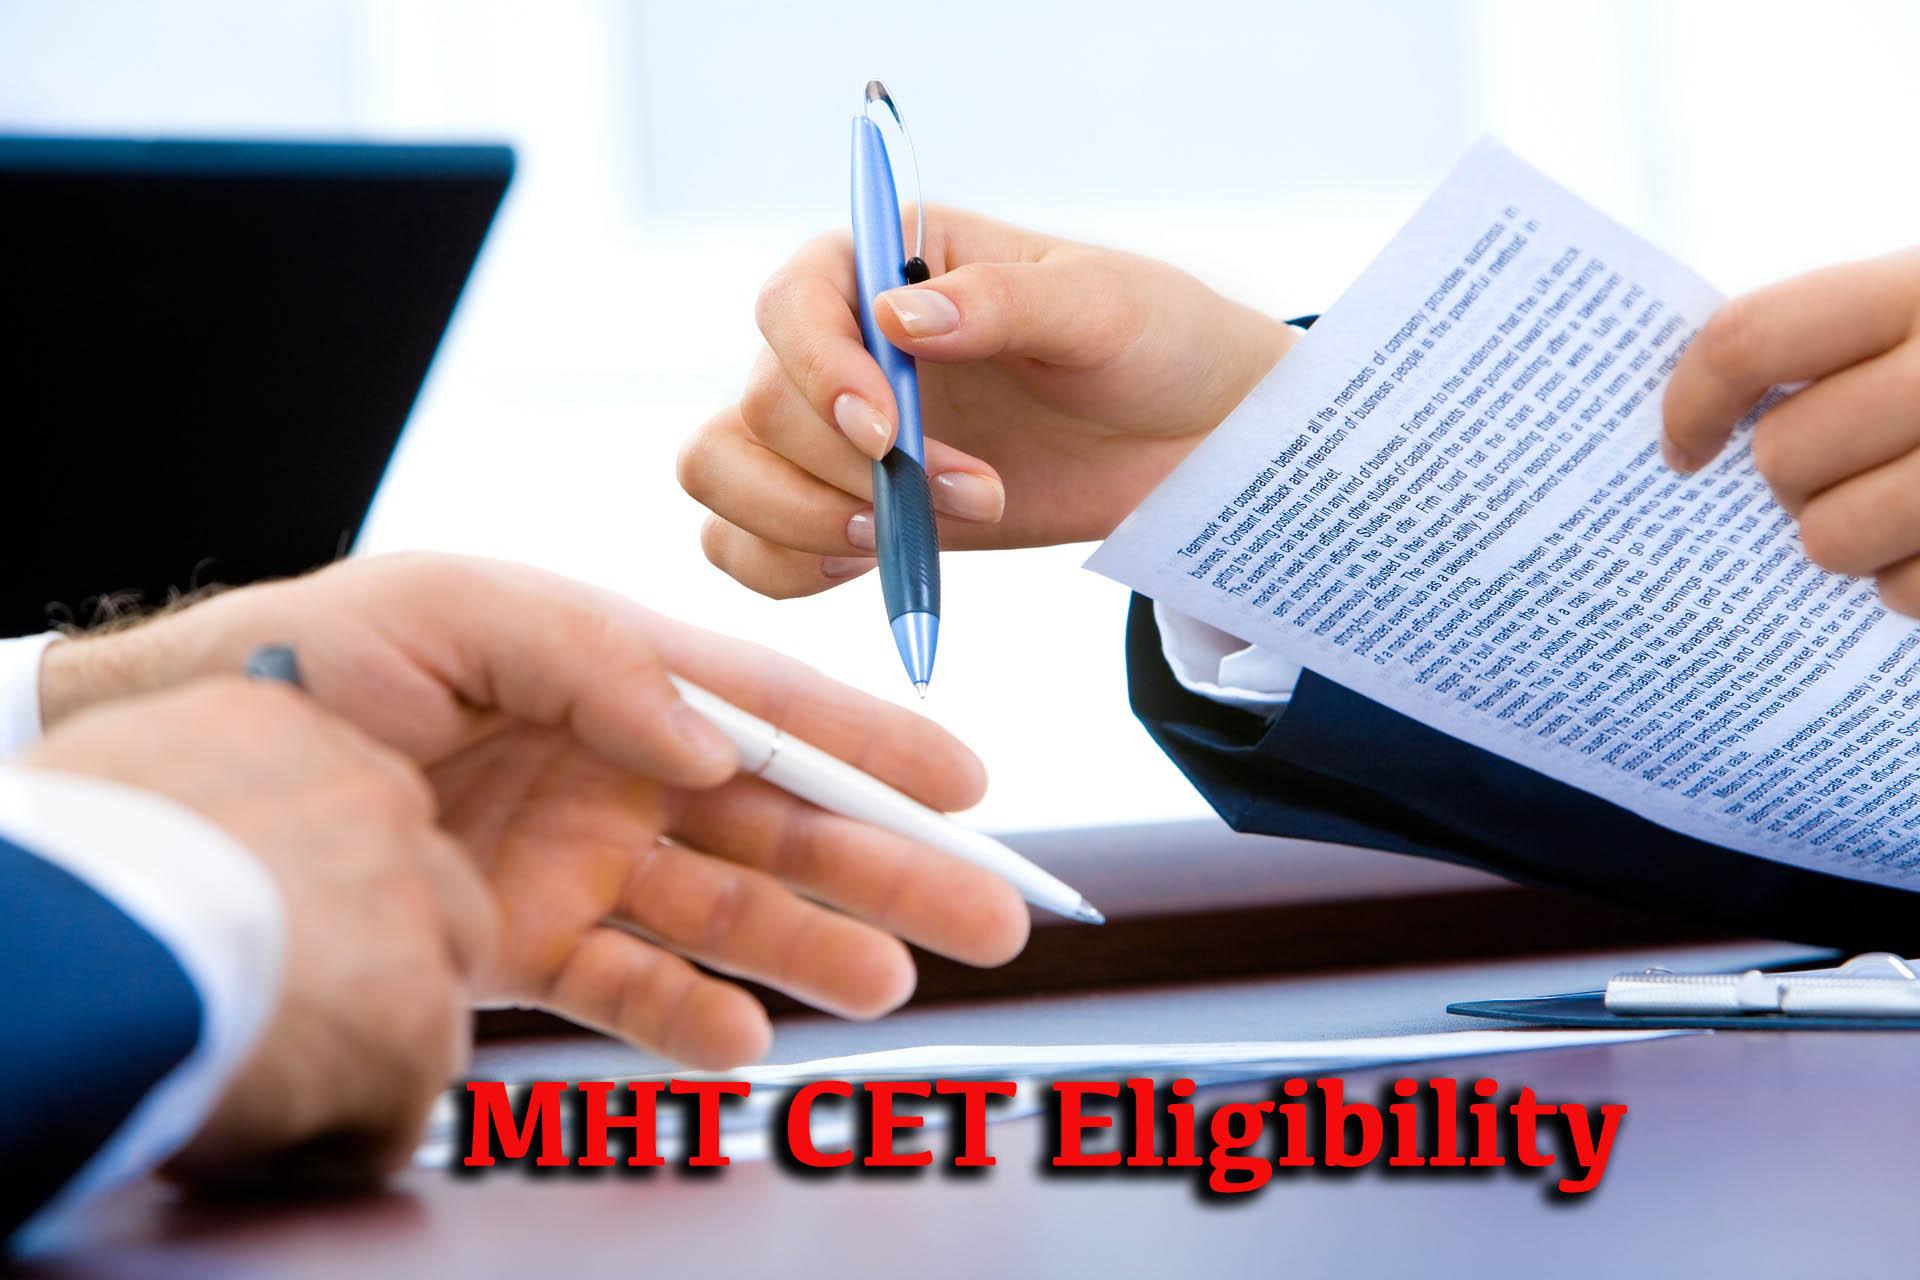 MHT CET Eligibility